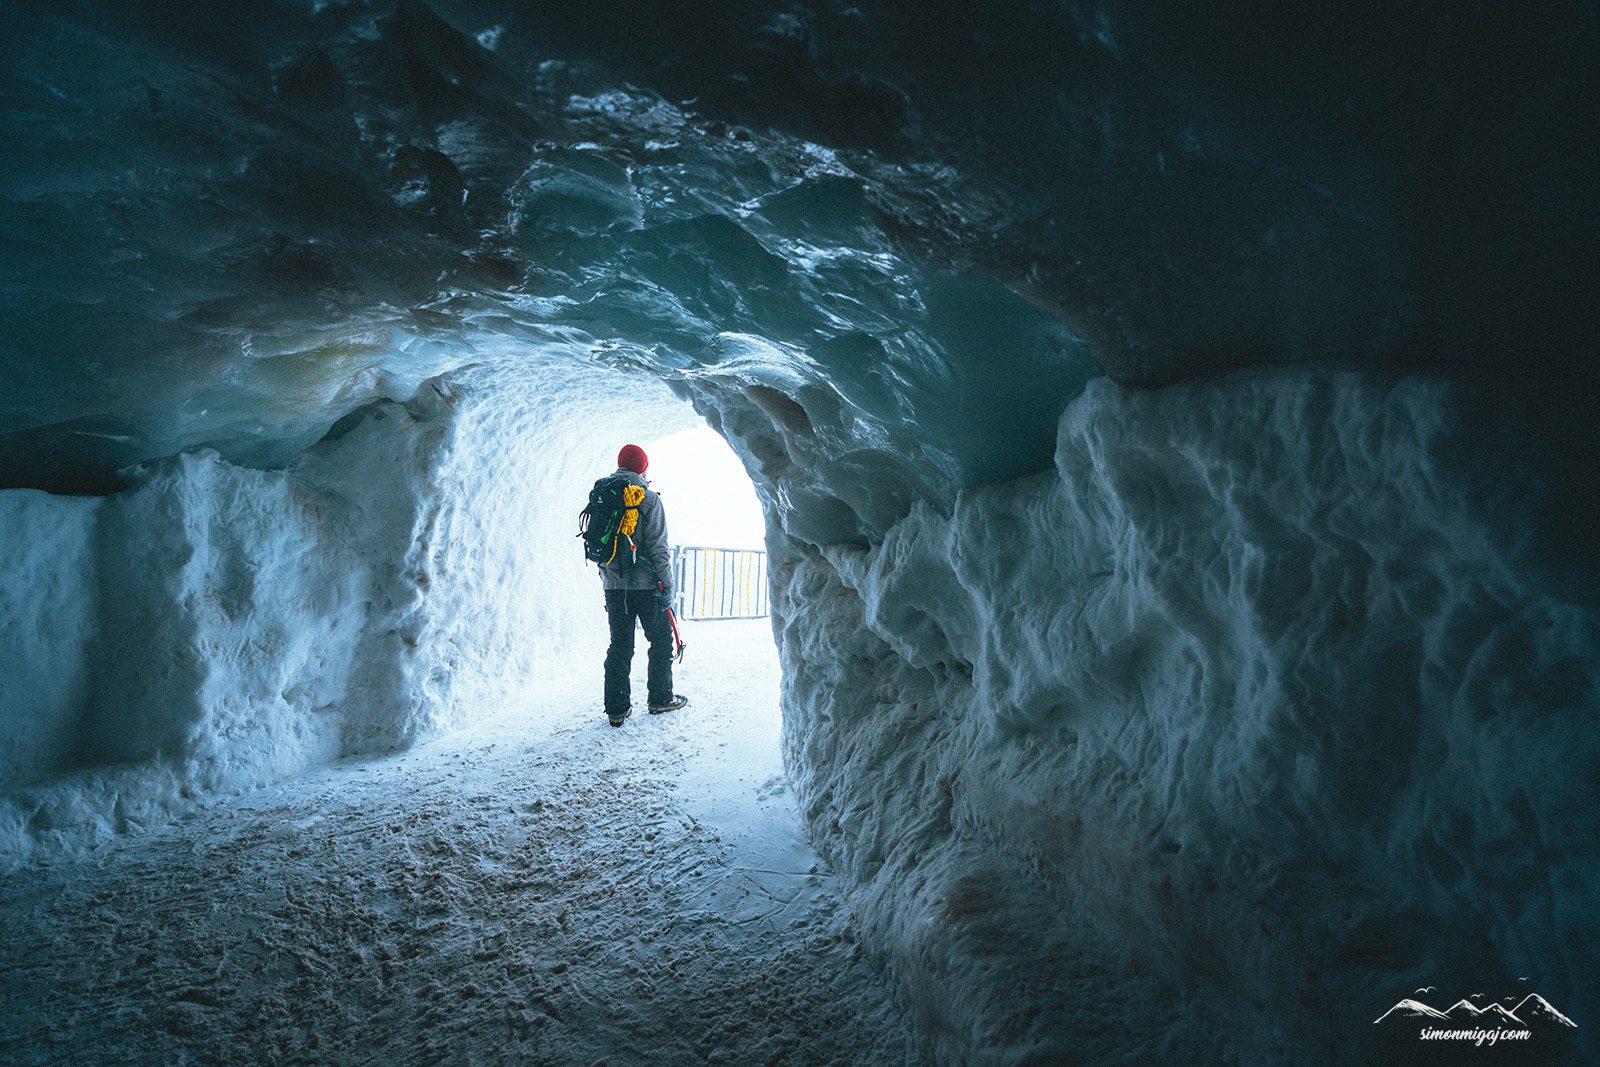 Ice-cave-aiguille-du-midi.jpg